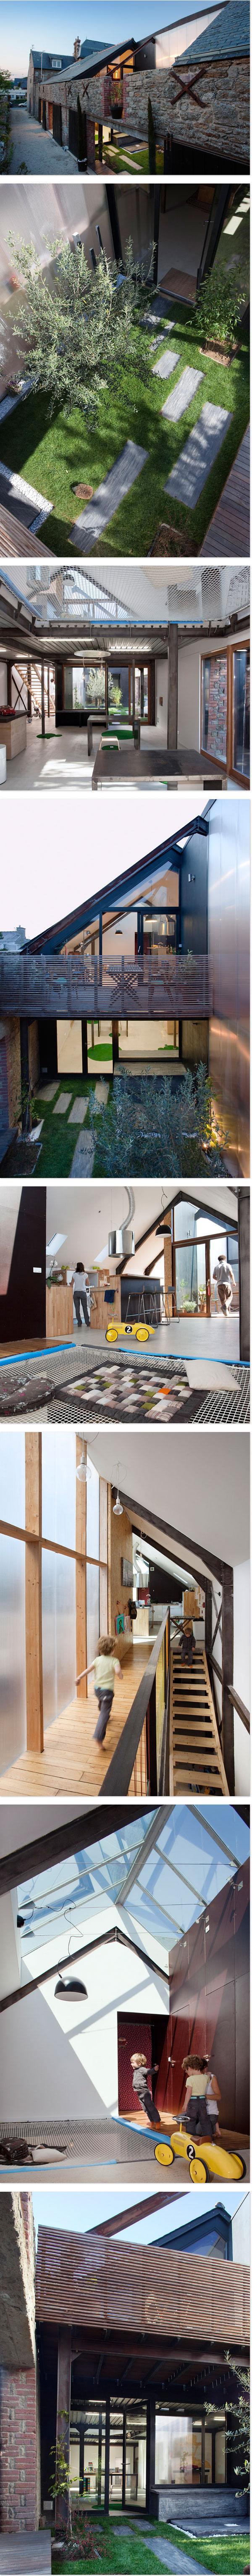 Haus in der Bretagne: Entres les Murs von Atelier 48.2